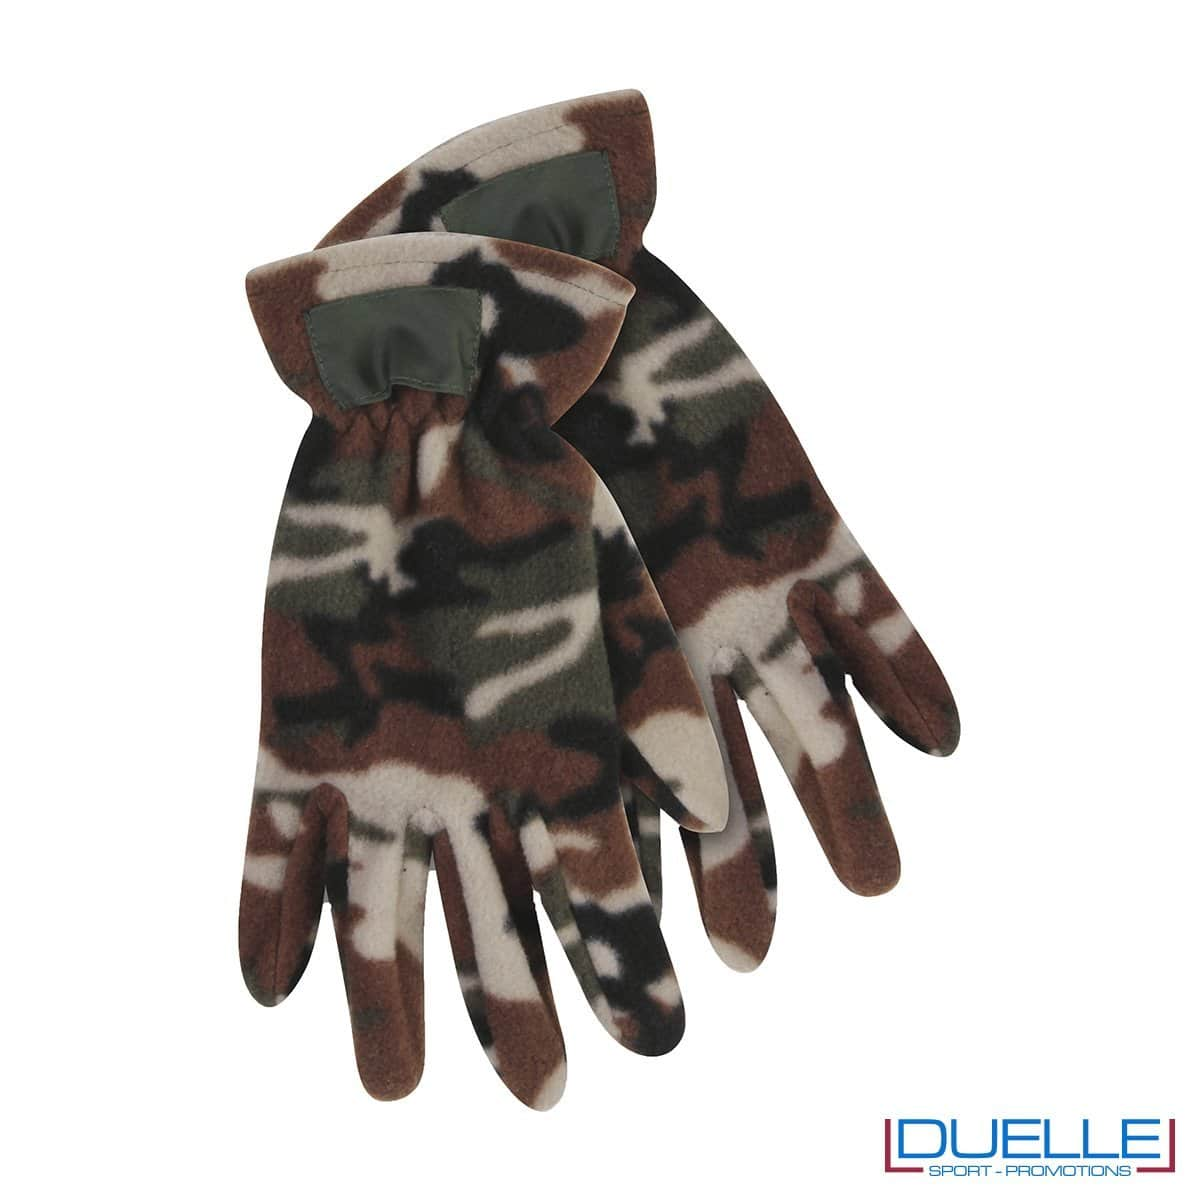 guanti in pile personalizzati in colore camouflage, guanti invernali personalizzati